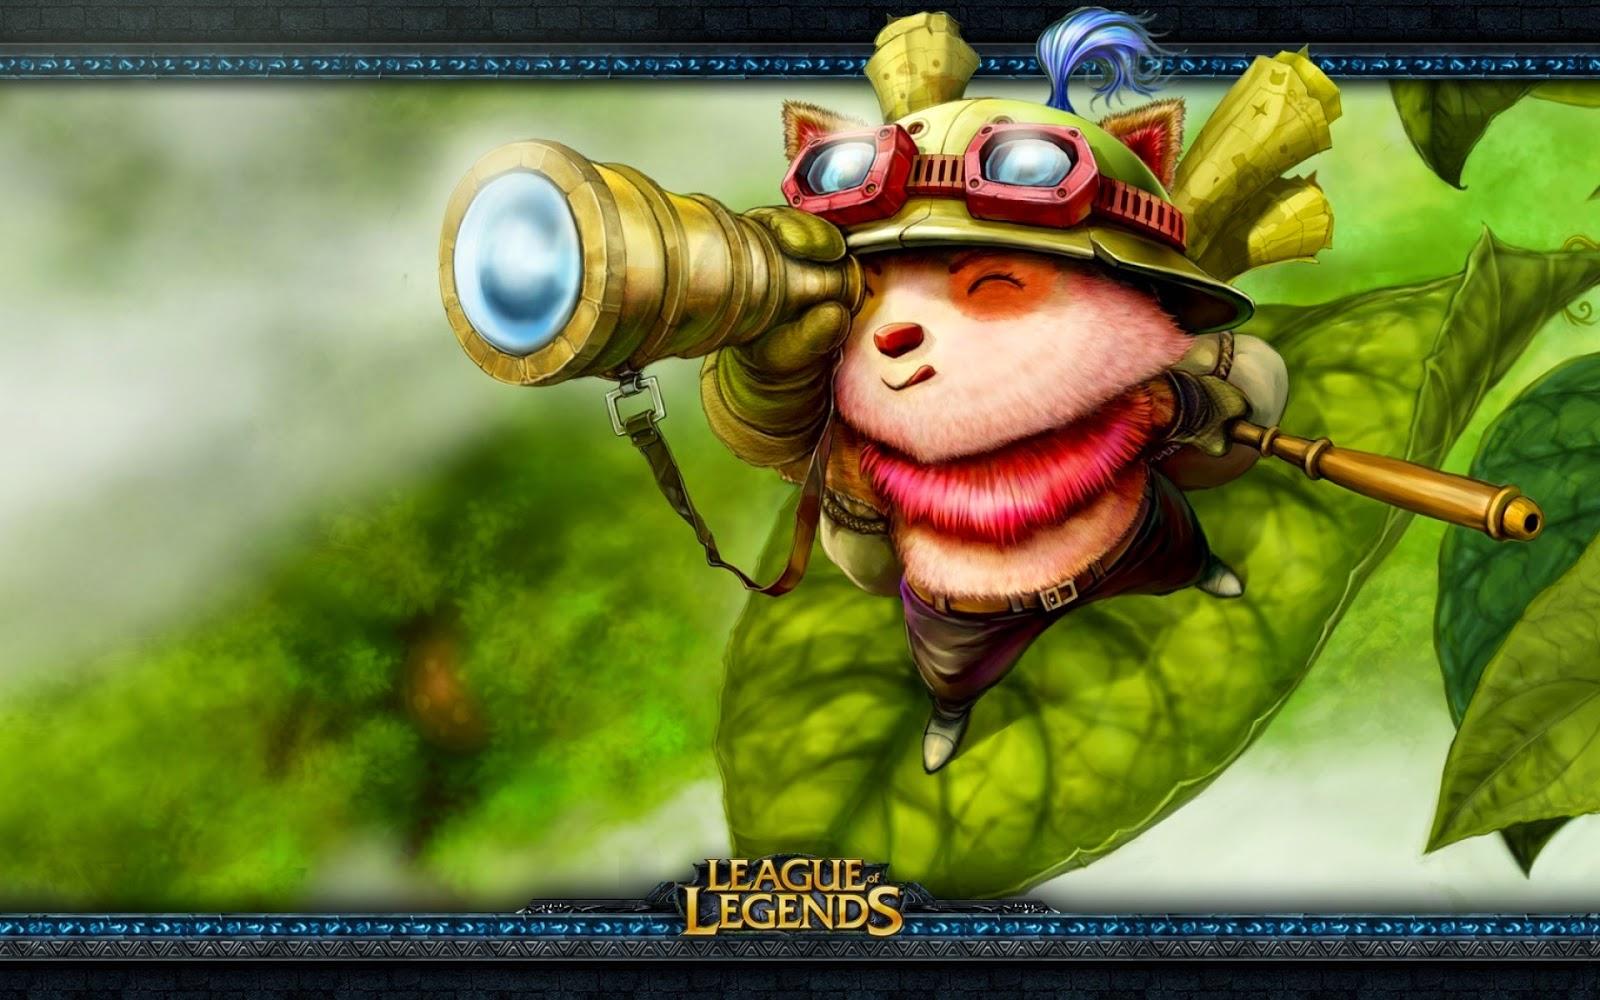 hinh-nen-game-lien-minh-huyen-thoai-anh-LOL-dep-12